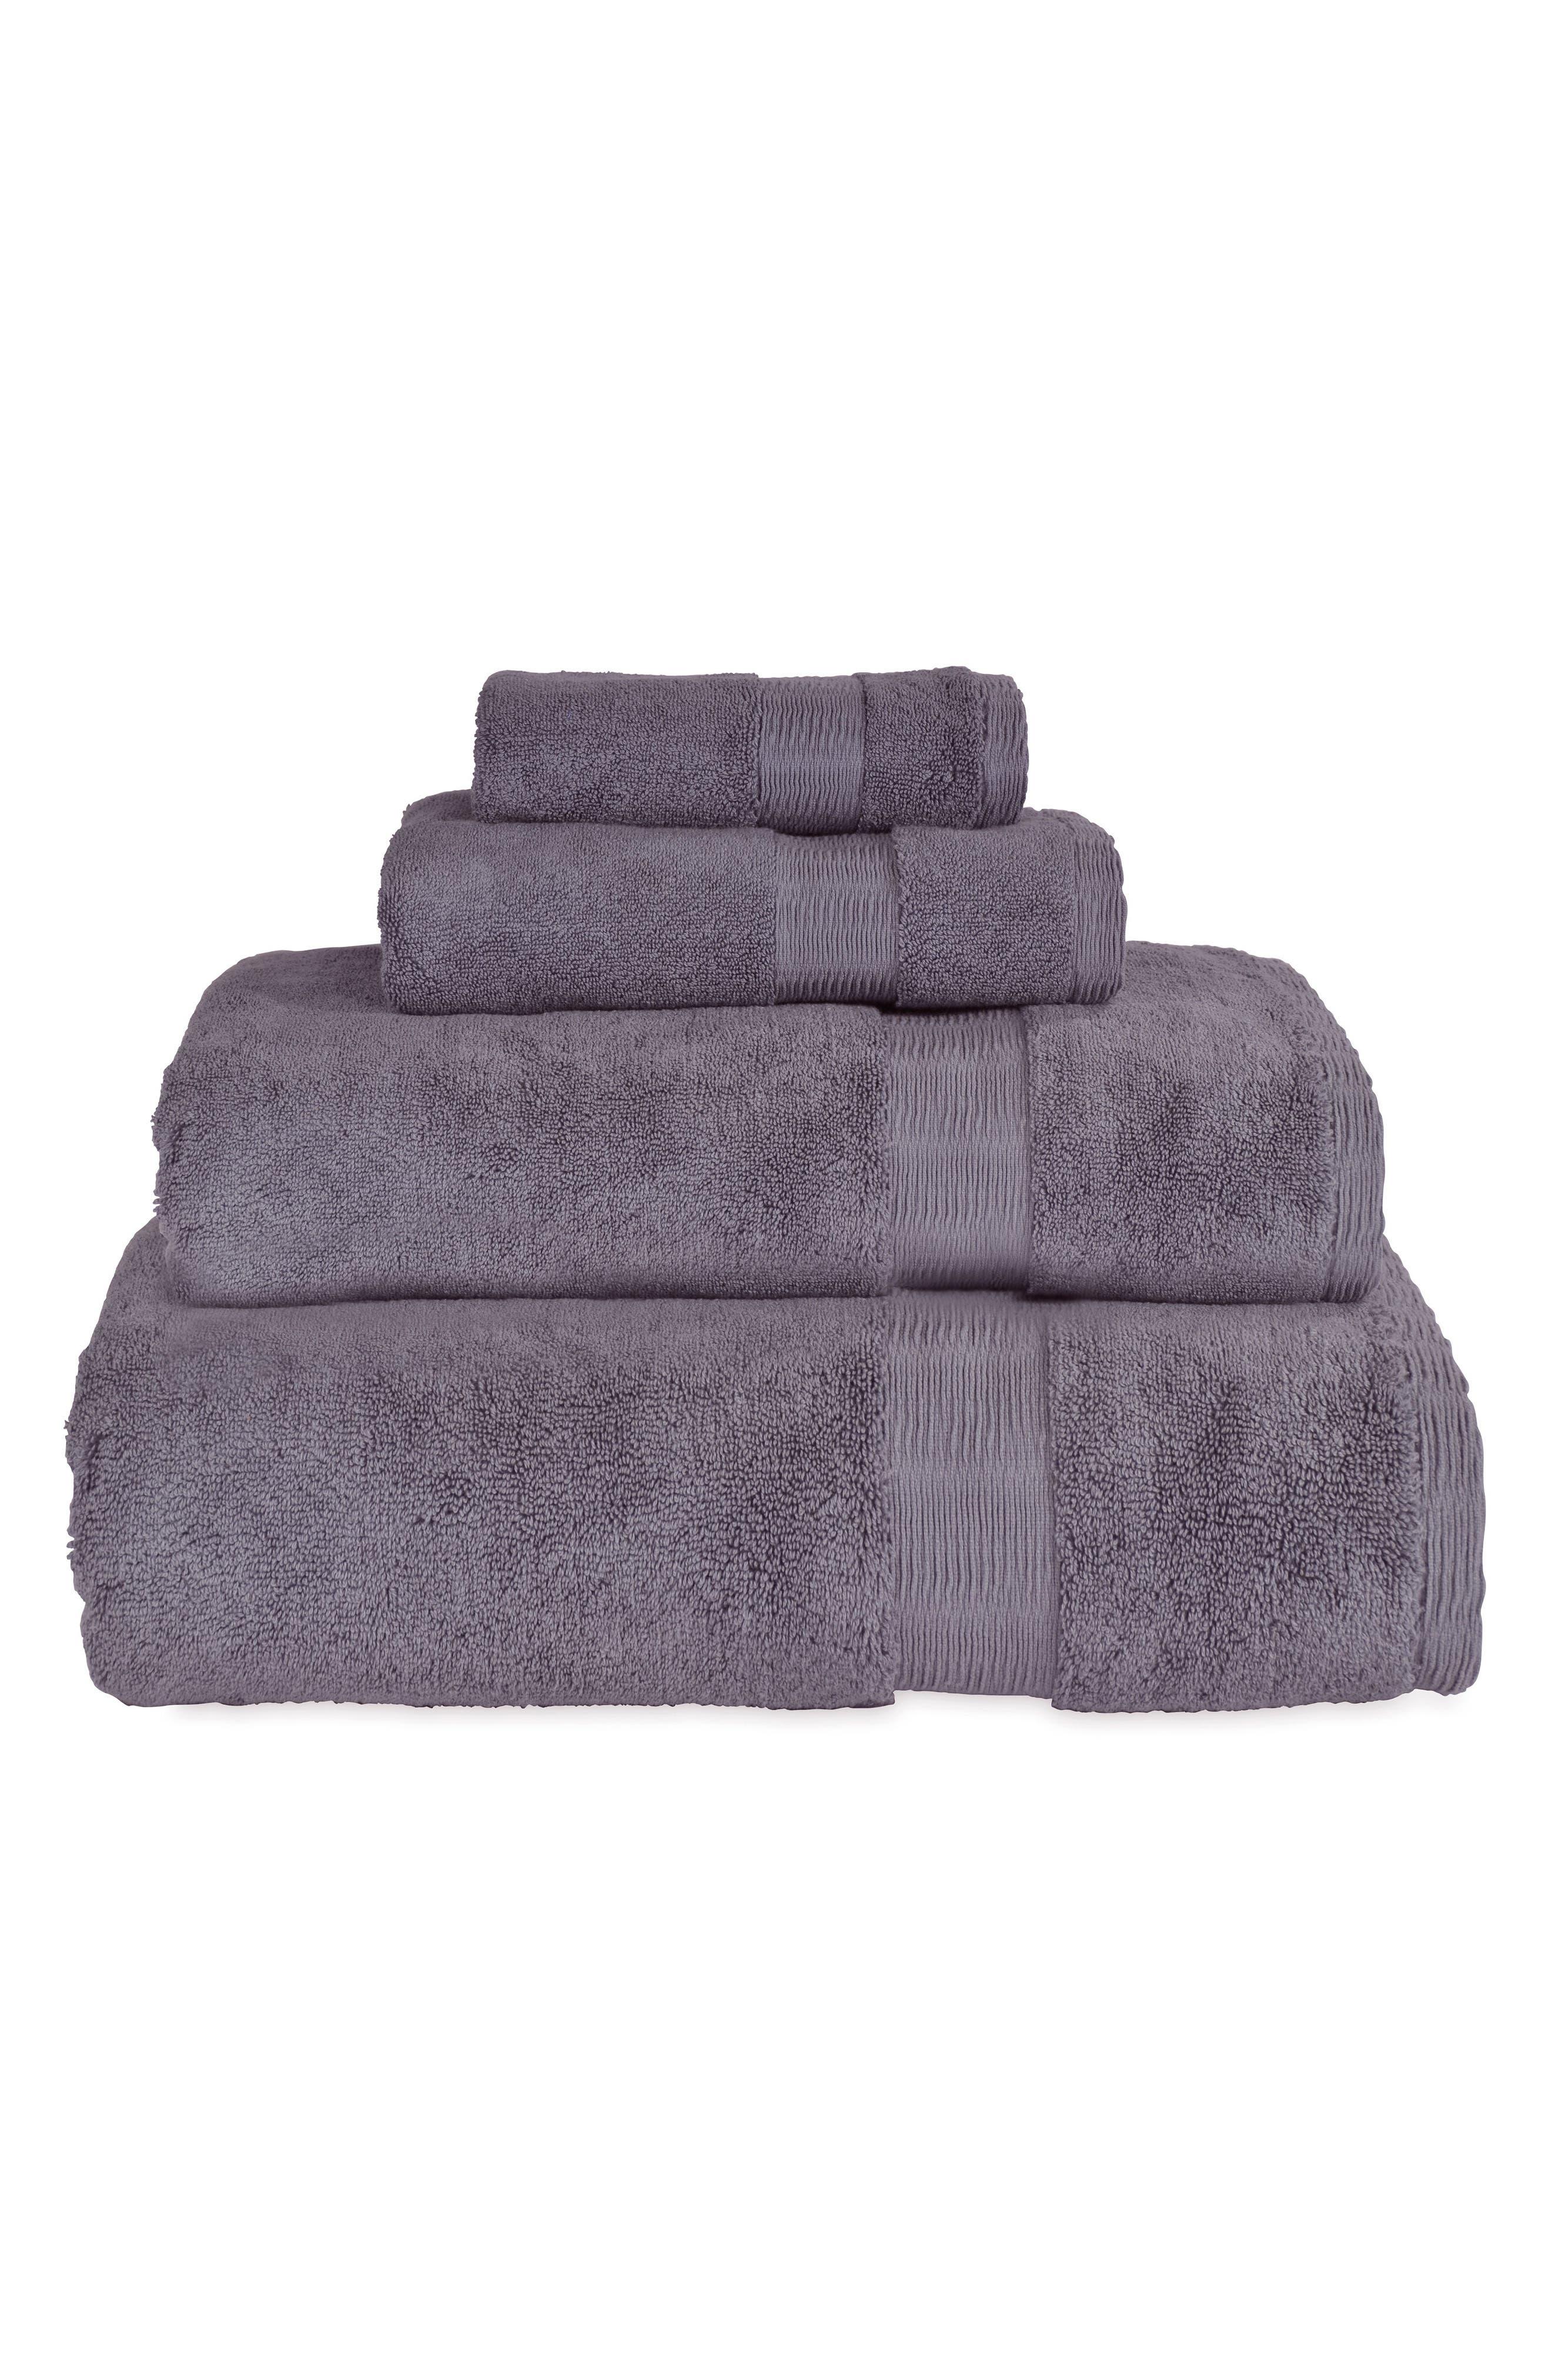 Mercer Hand Towel,                             Alternate thumbnail 2, color,                             531